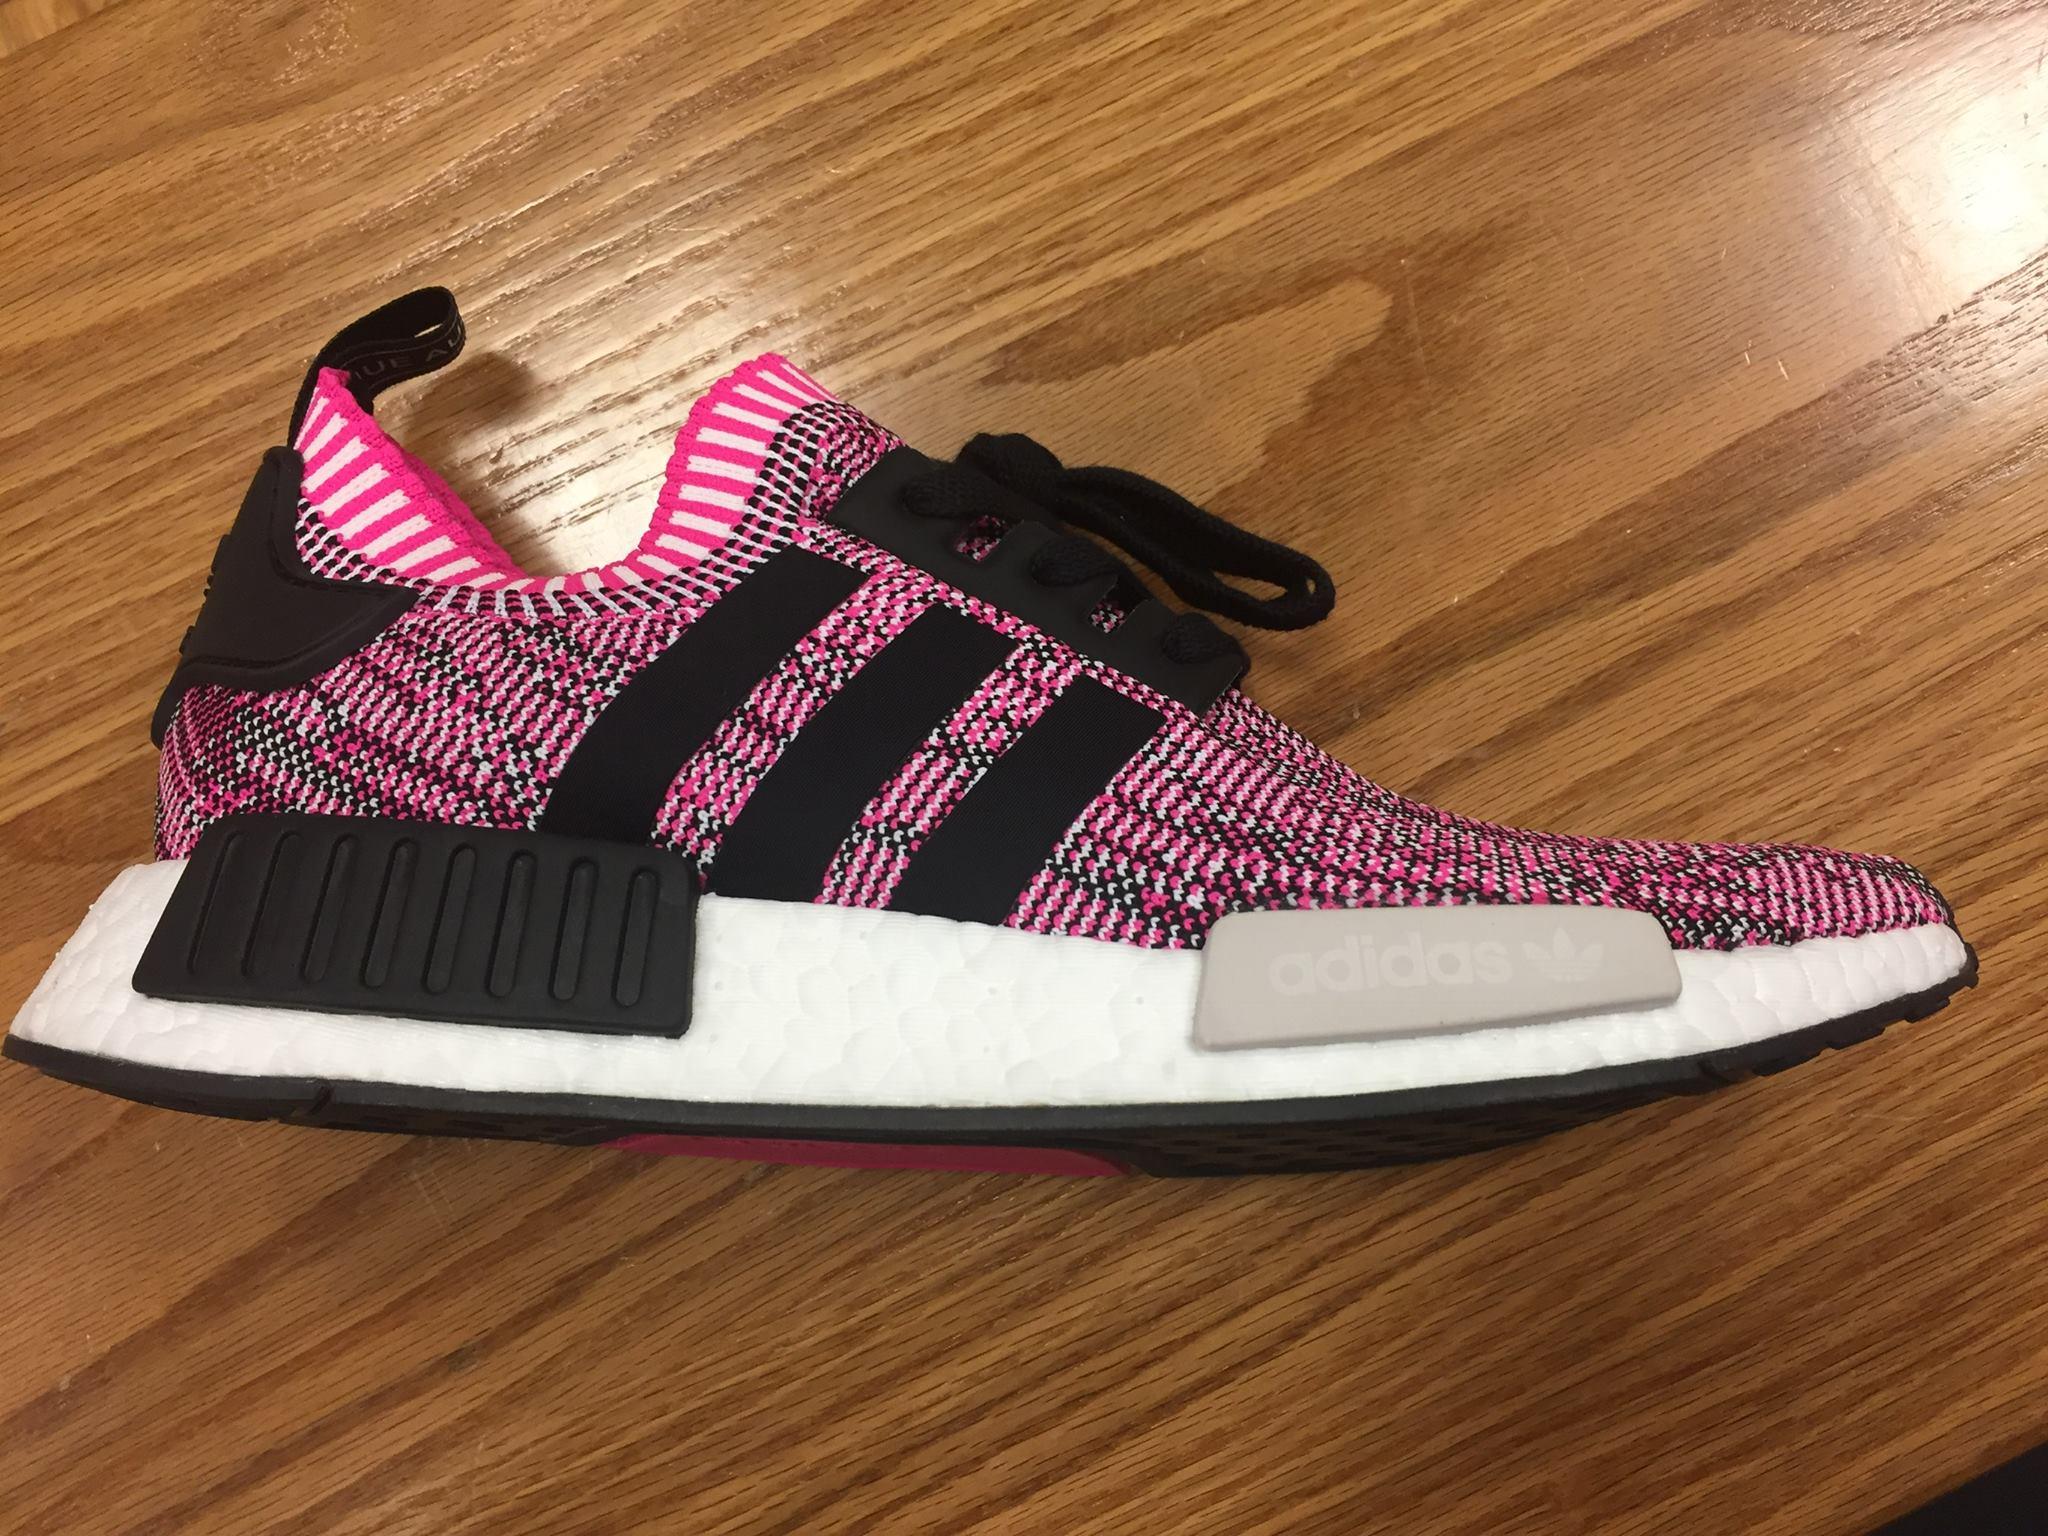 78da62d173432 Women s Adidas NMD R1 Shock Pink Core White On Sale Now New – Housakicks